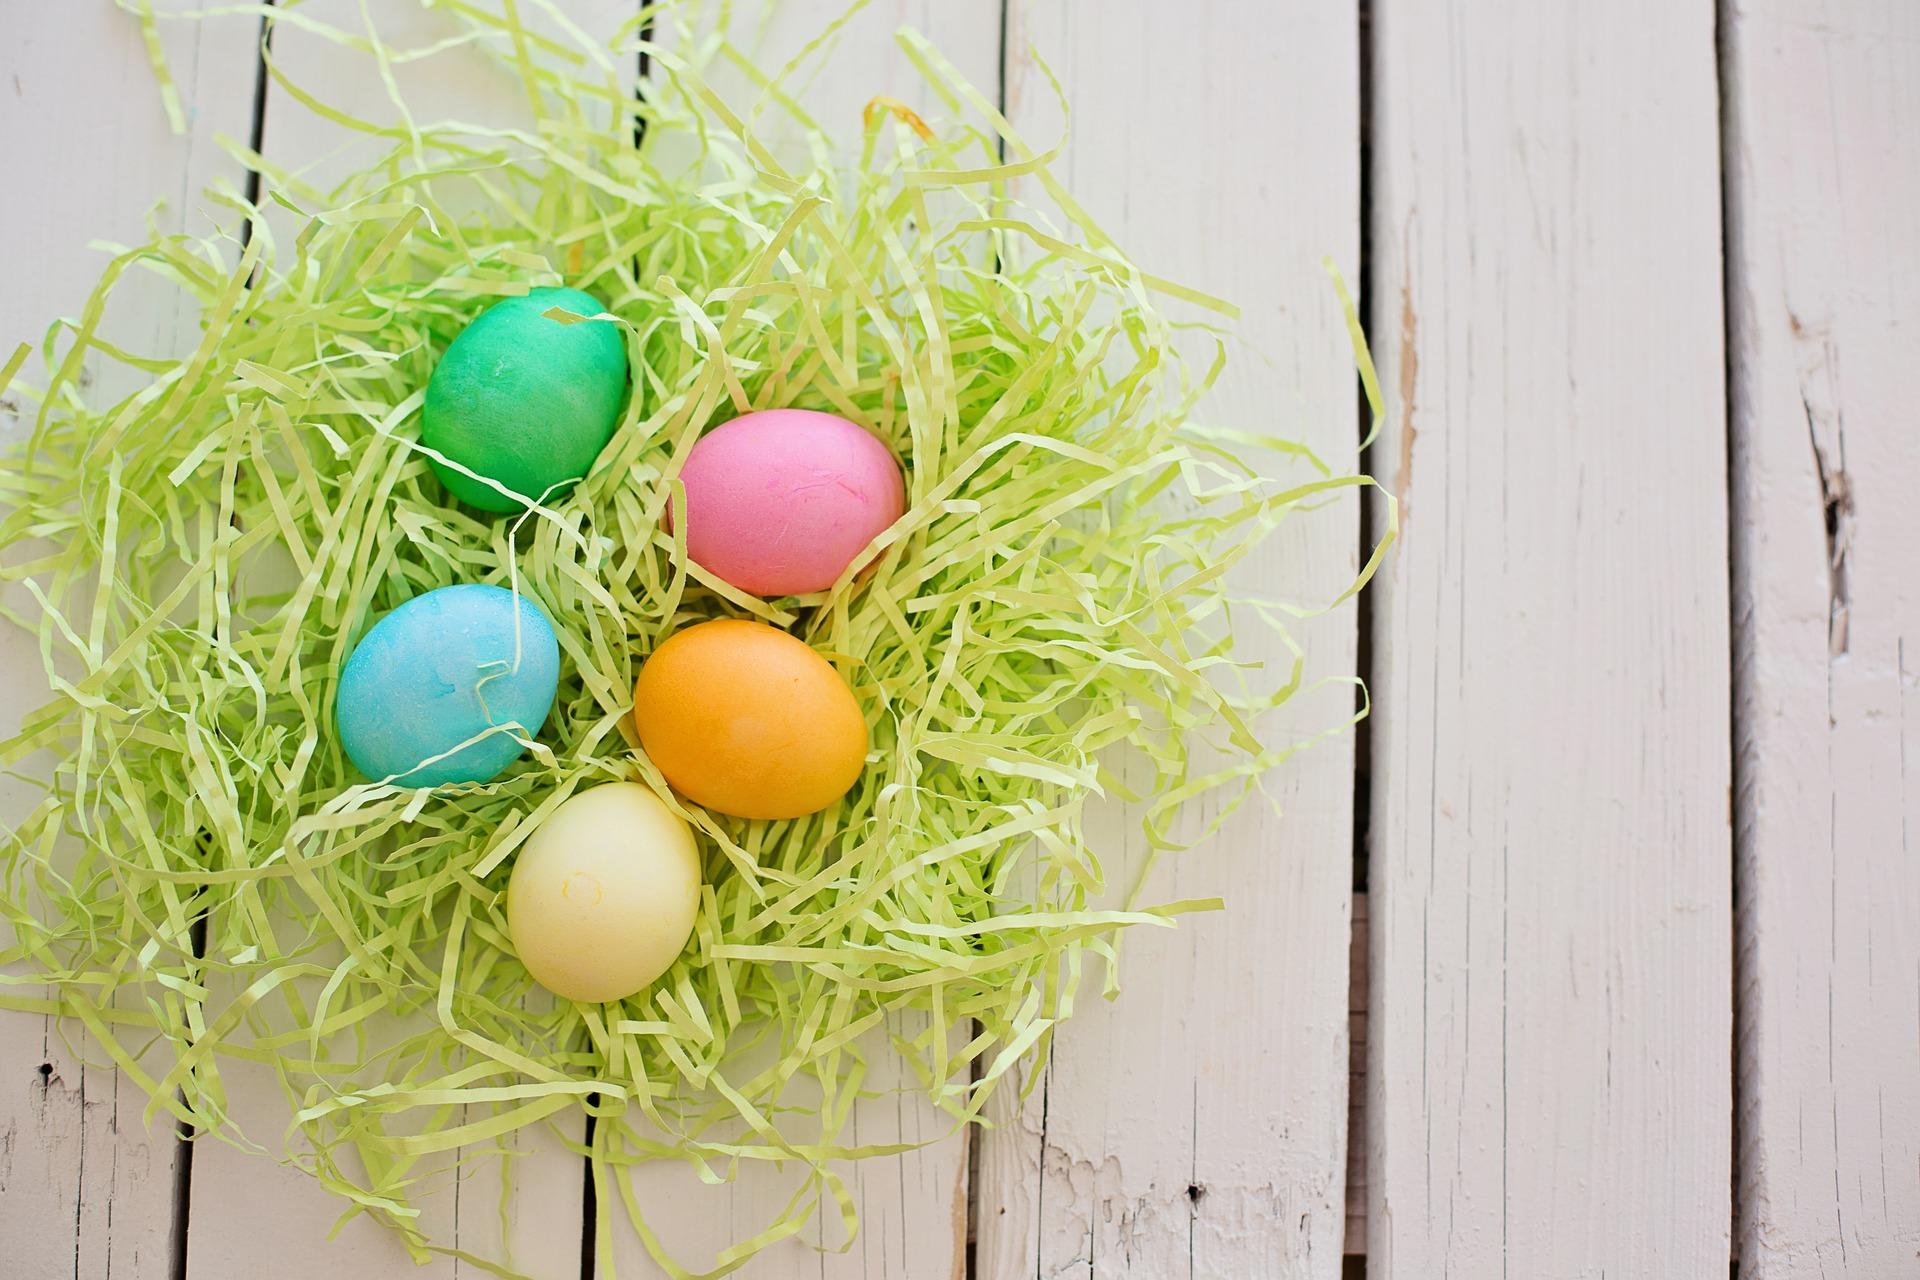 Banish The Easter Bunny